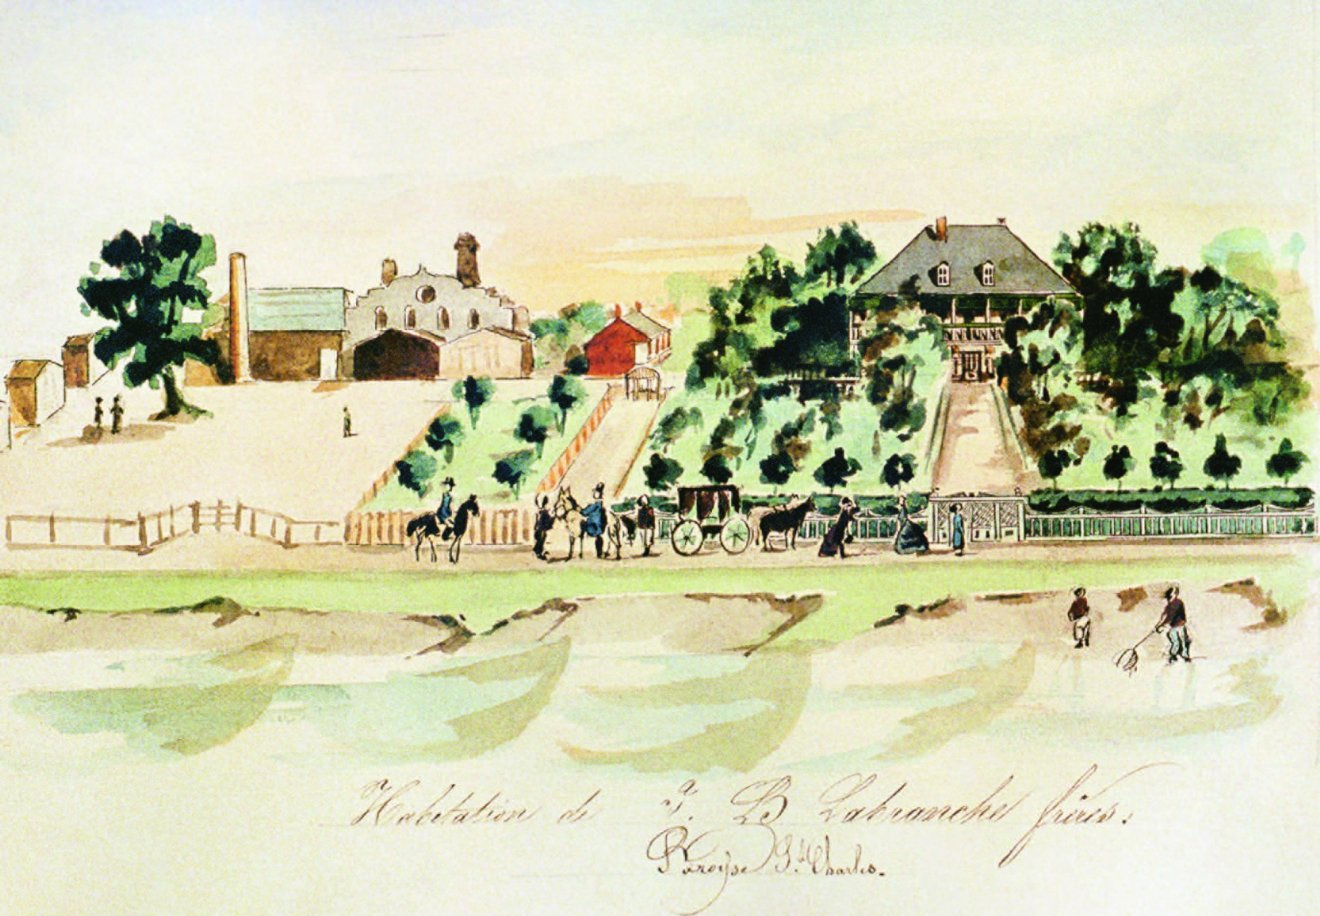 Estate of Jean Baptist LaBranche